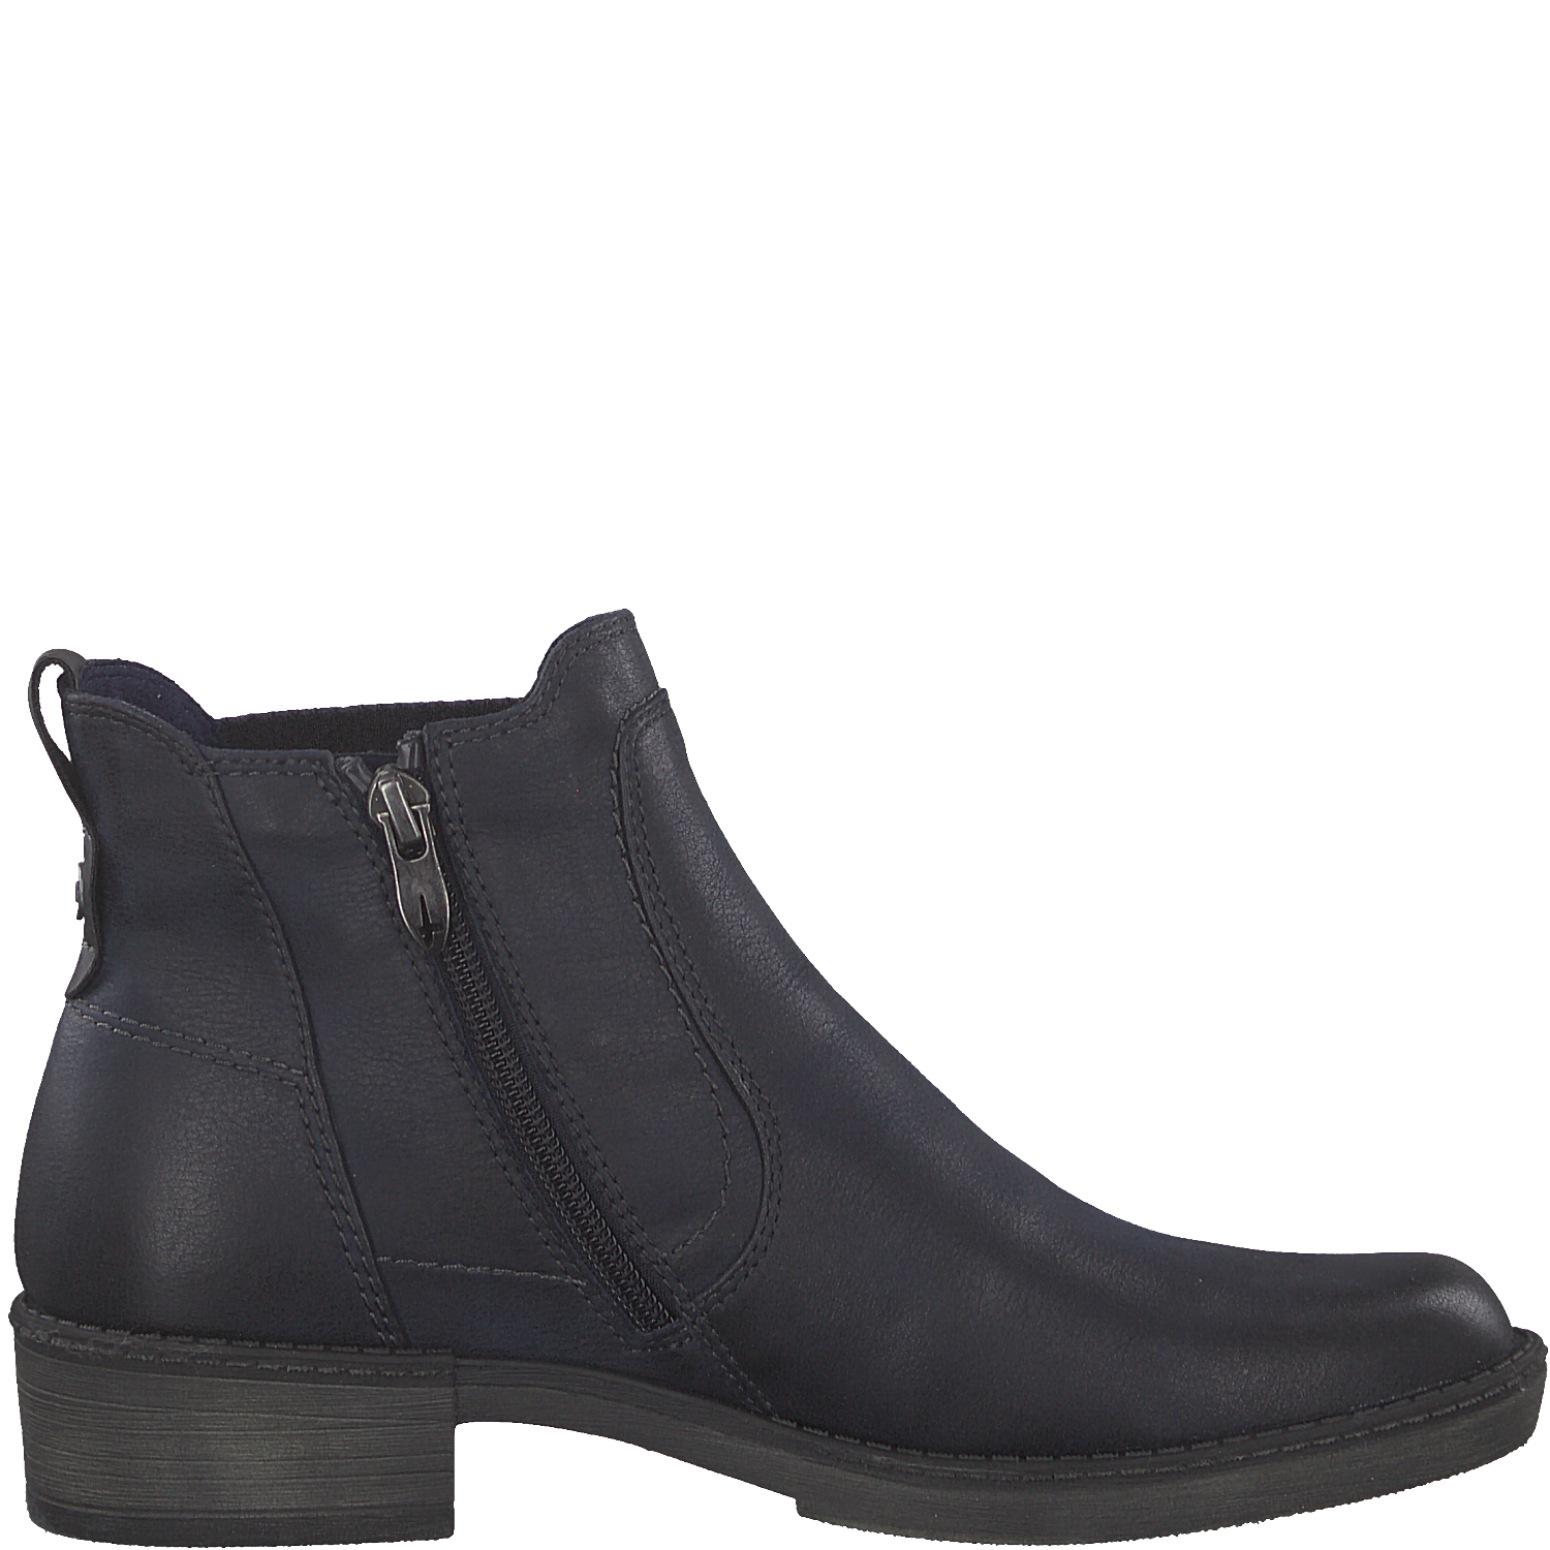 best choice factory price save up to 80% Tamaris Damen Stiefelette / Chelsea Boots 1-25309-21-805 navy blau